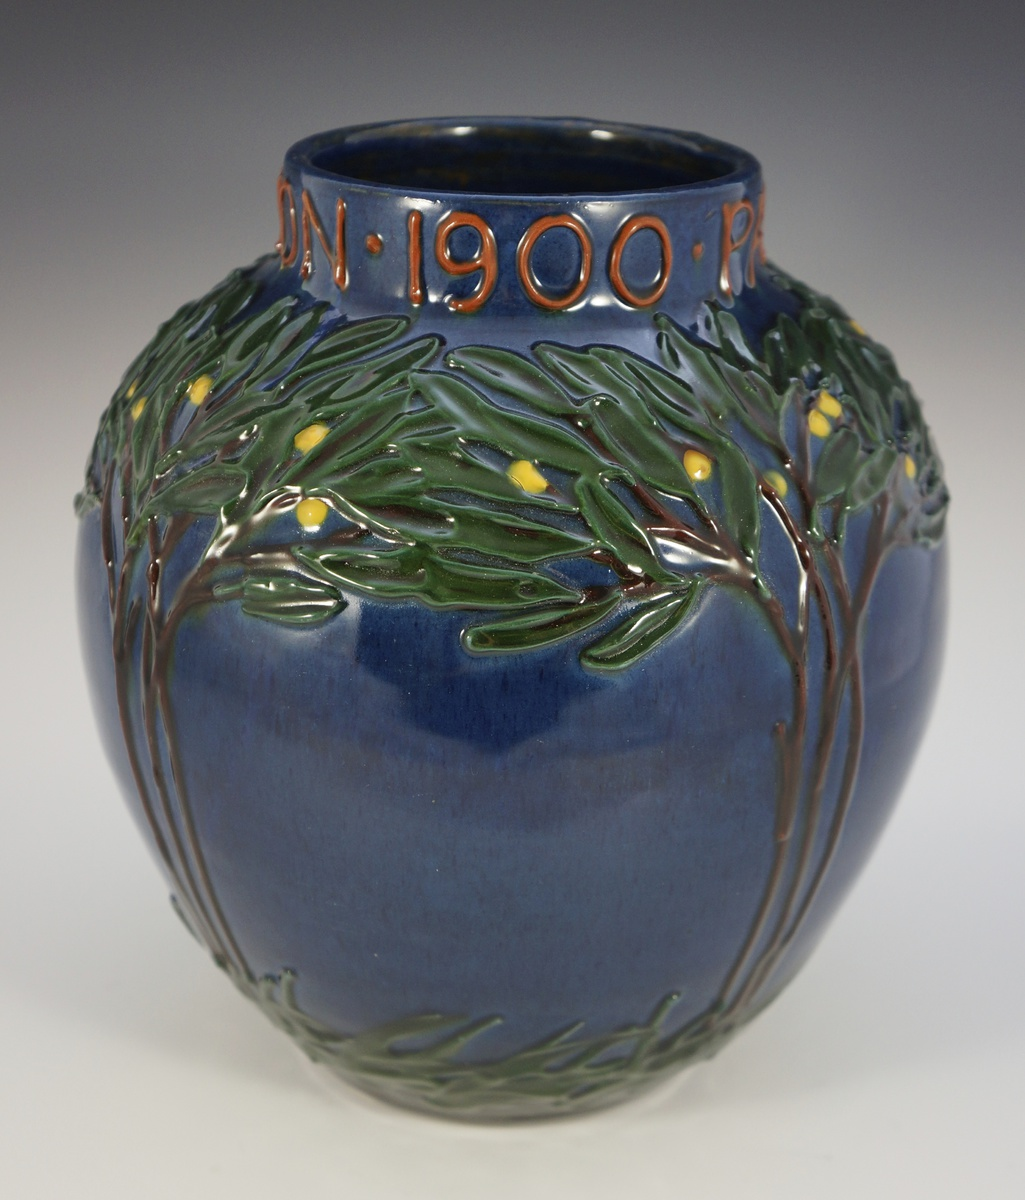 Max läuger la maison moderne paris expo 1900 vase collectors weekly